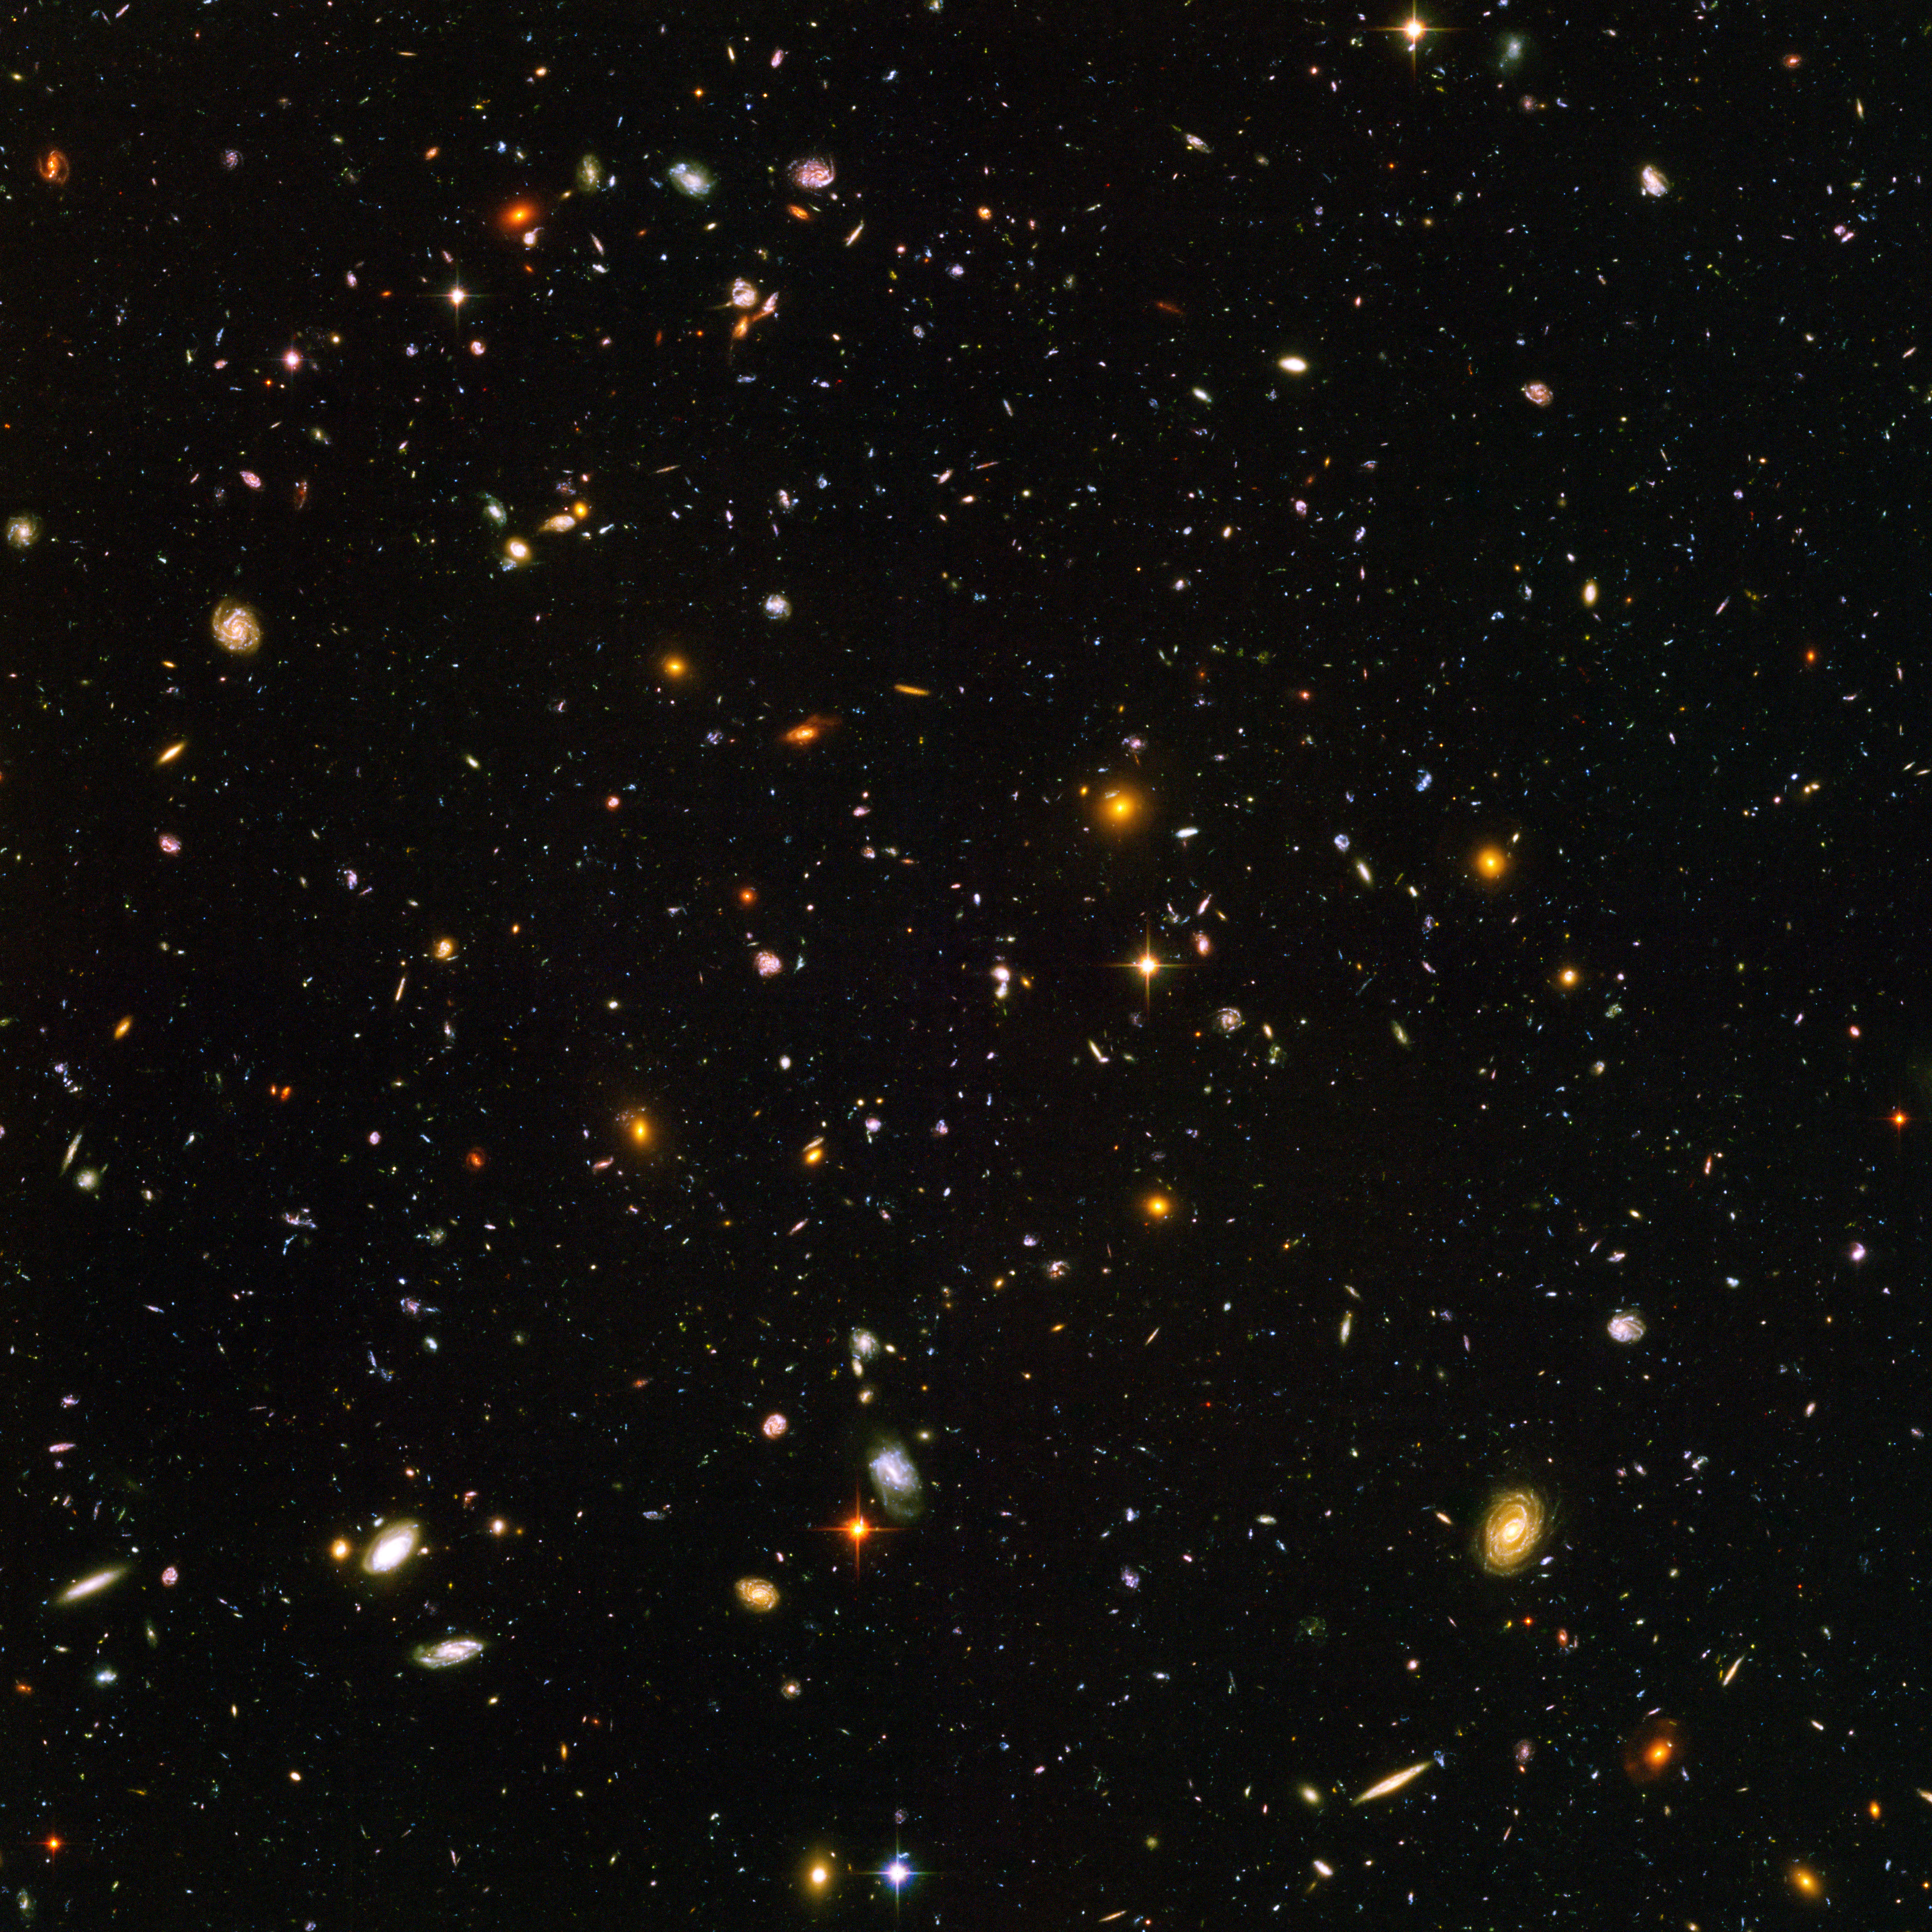 Galaxy clipart nasa Desktop NASA Wallpapers Science Killer